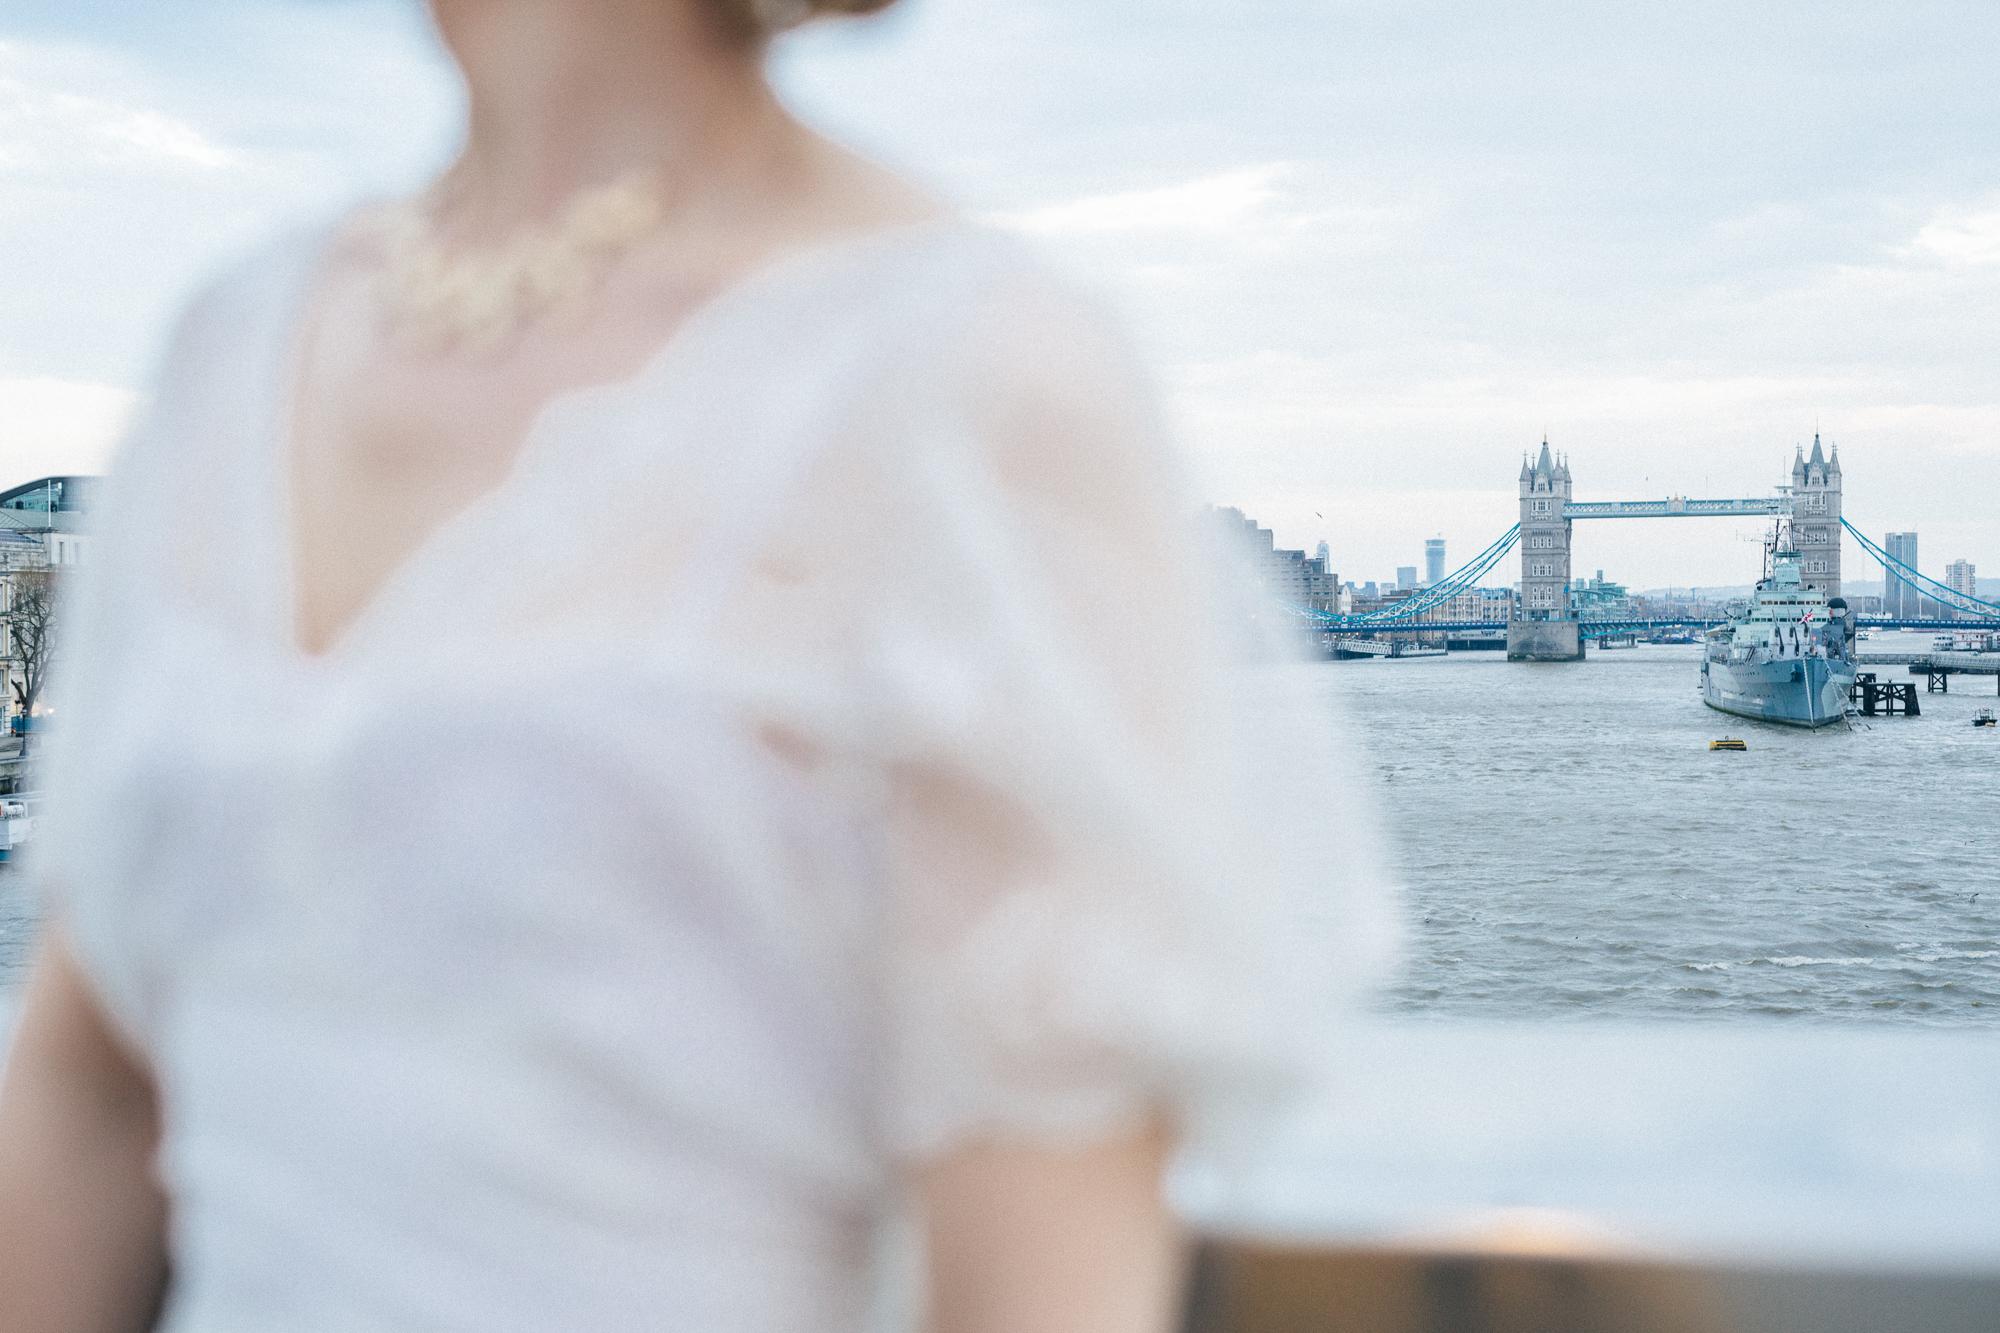 weddingphotographer_lindarehlin_preweddingphoto_london_SensibleM-64.jpg